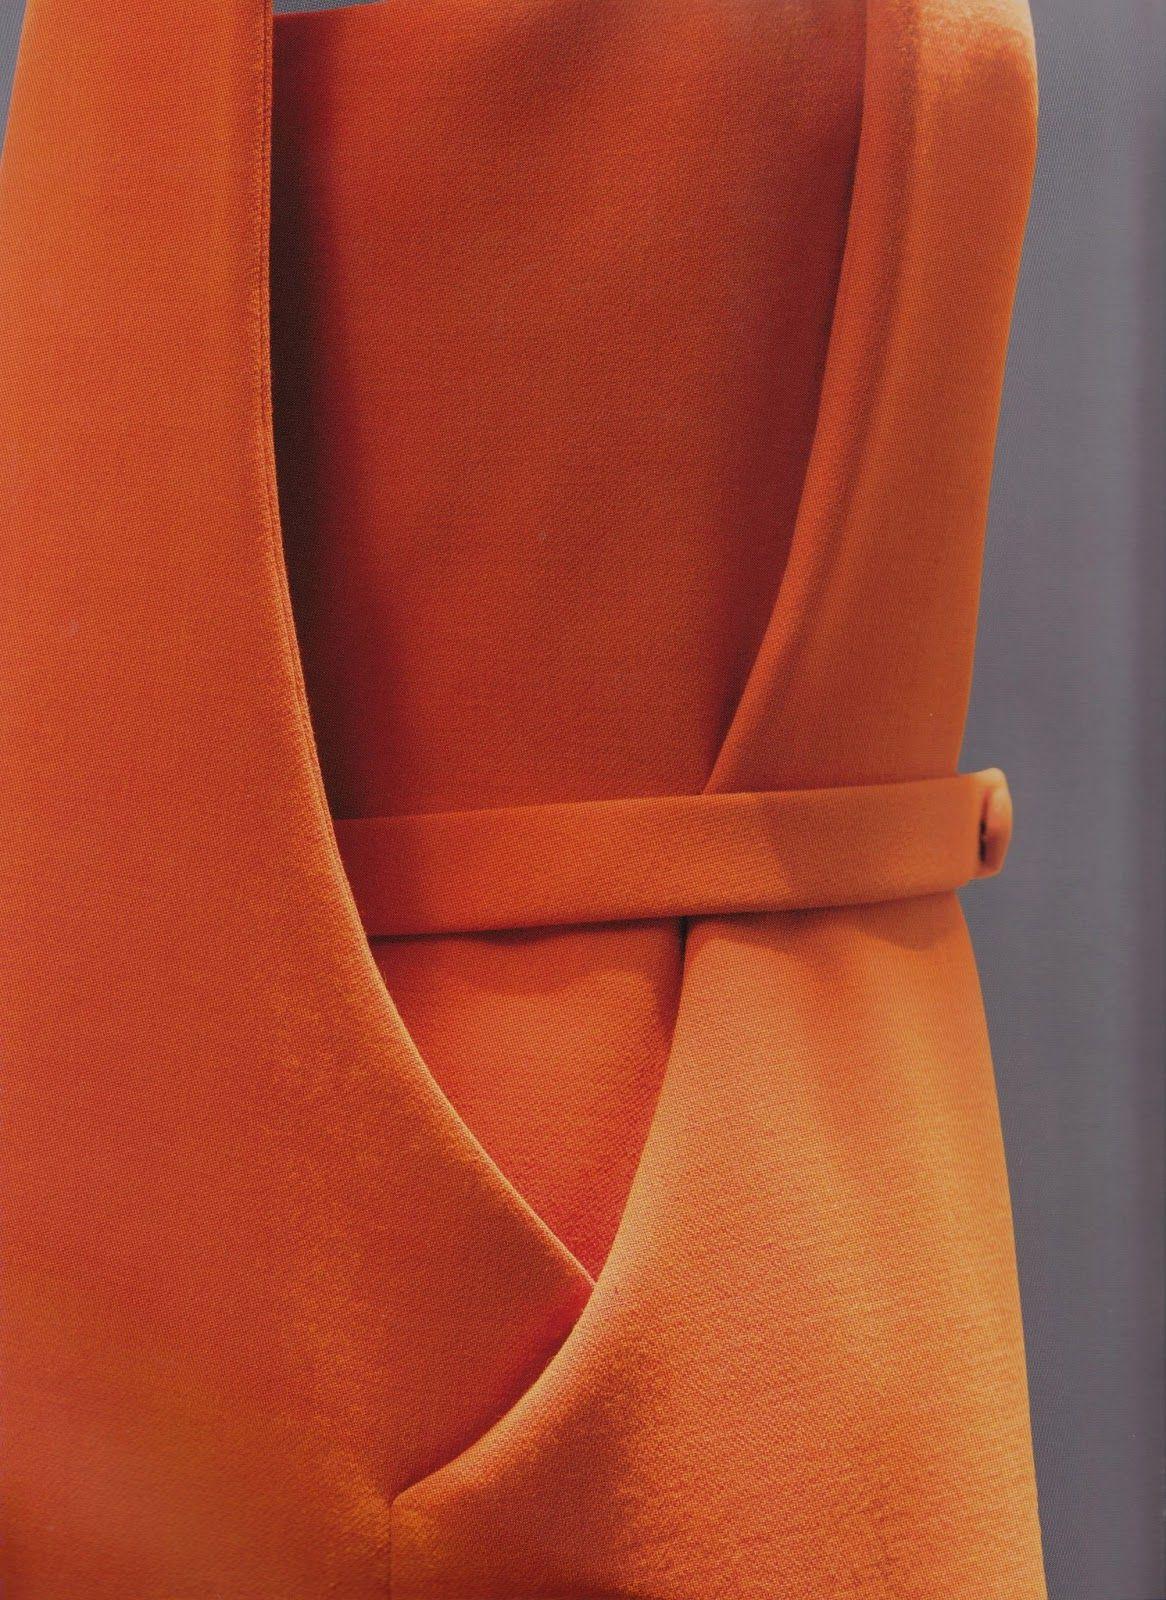 Day dress in orange wool crepe, side view, c. 1968